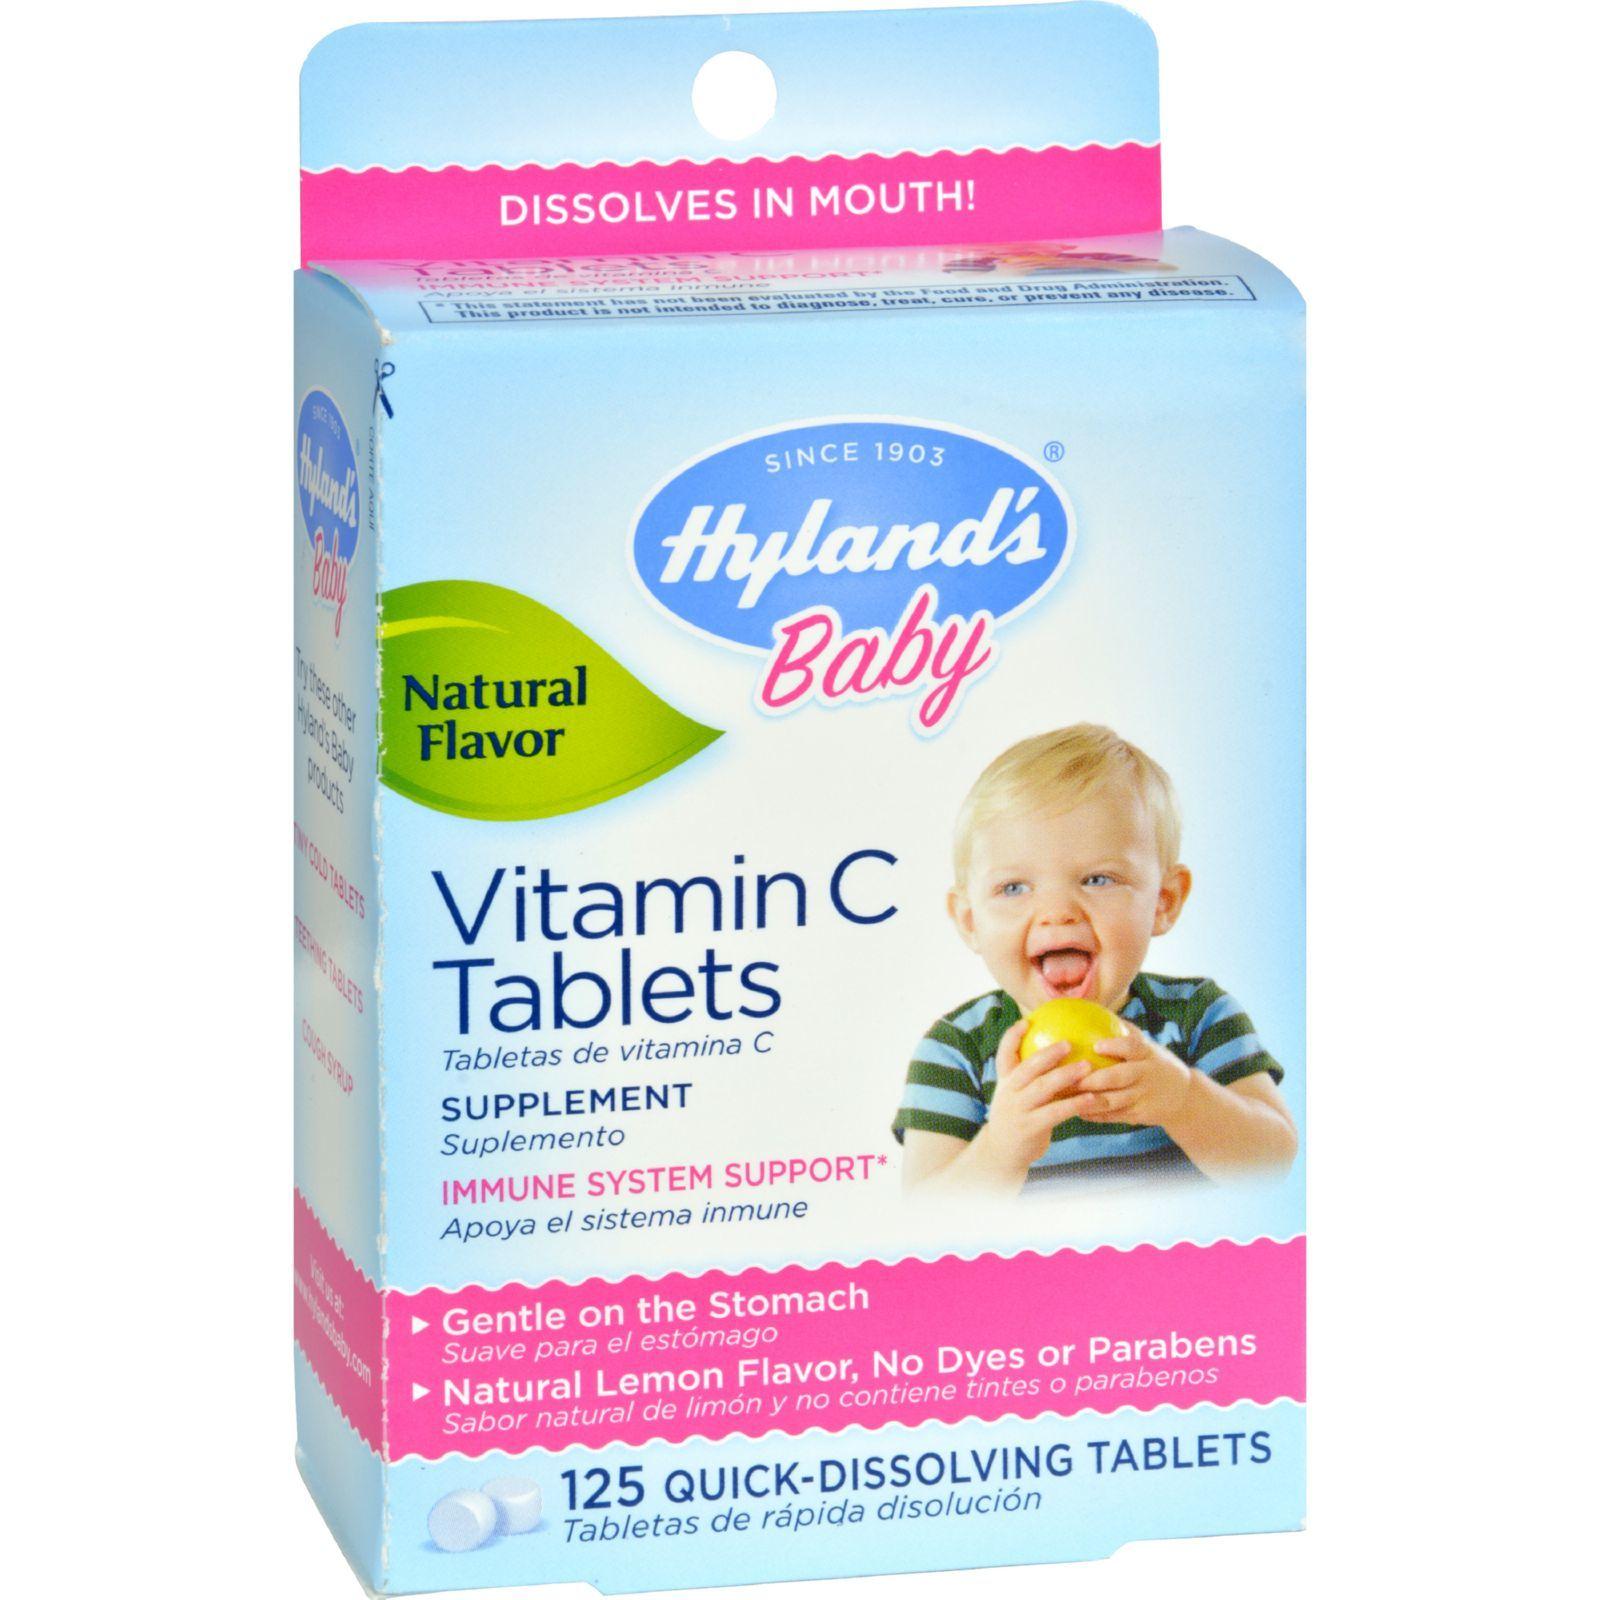 Hyland's Vitamin C Tablets Natural Lemon - 25 mg - 125 Tablets